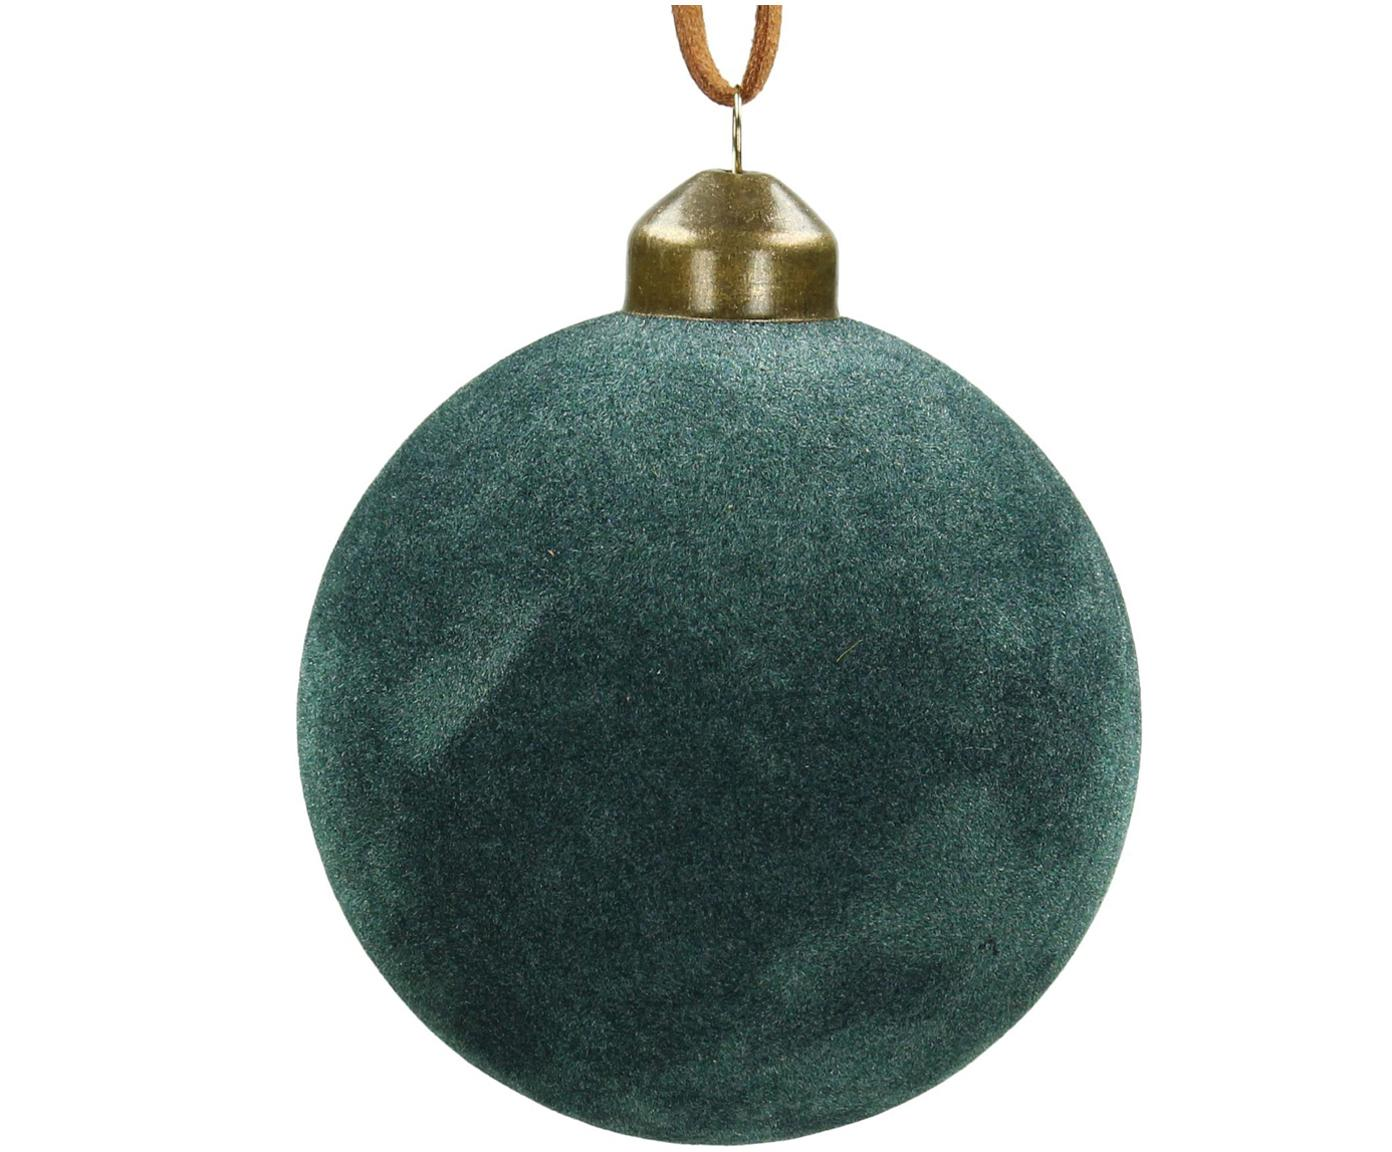 Weihnachtskugeln Velvet Ø8cm, 4Stück, Glas, Polyestersamt, Blaugrün, Ø 8 cm